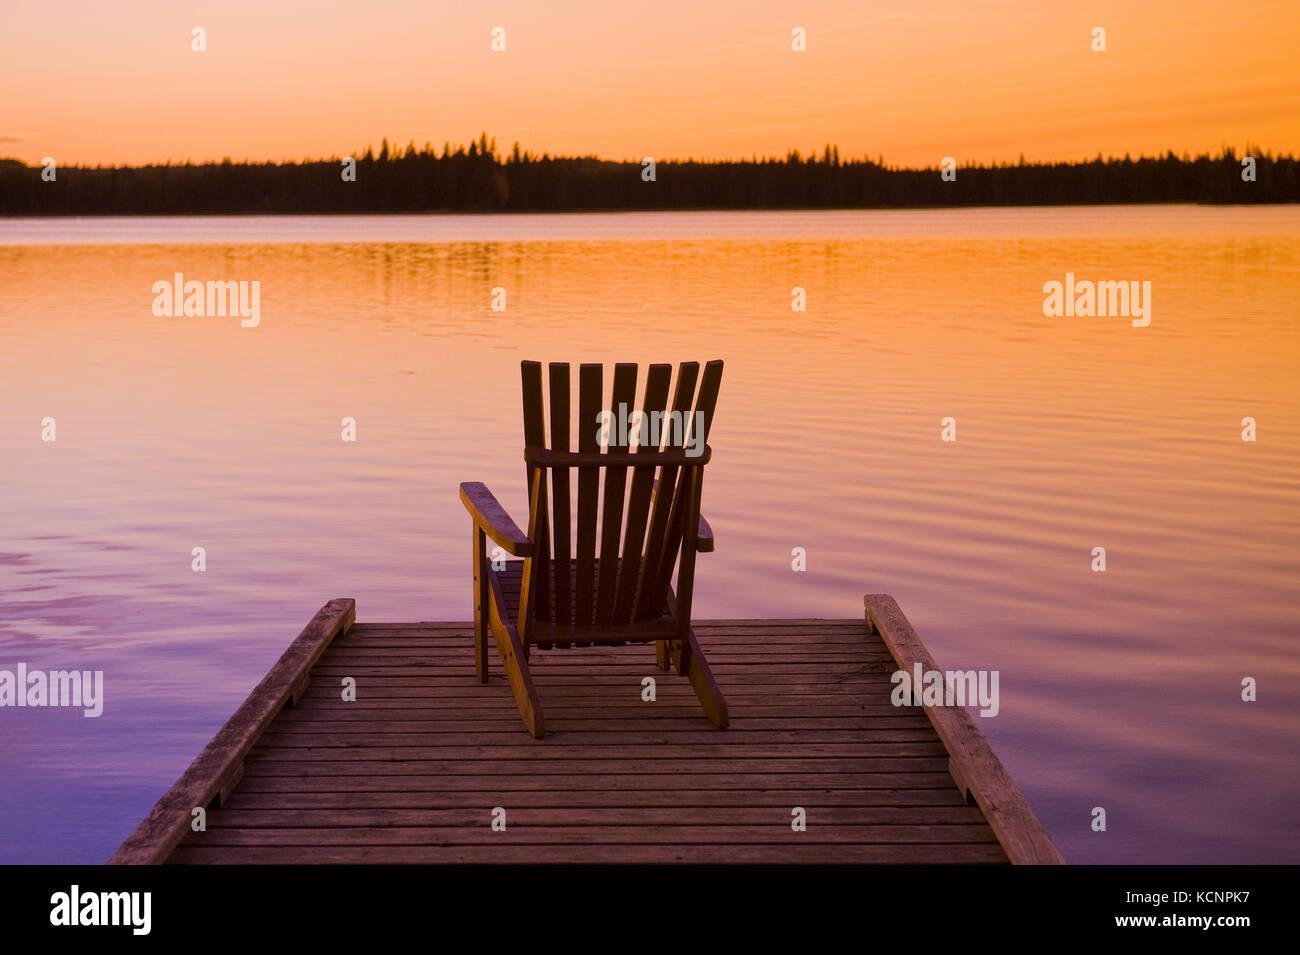 muskoka chair on dock, Beautiful Lake , Duck Mountain Provincial Park, Manitoba, Canada - Stock Image